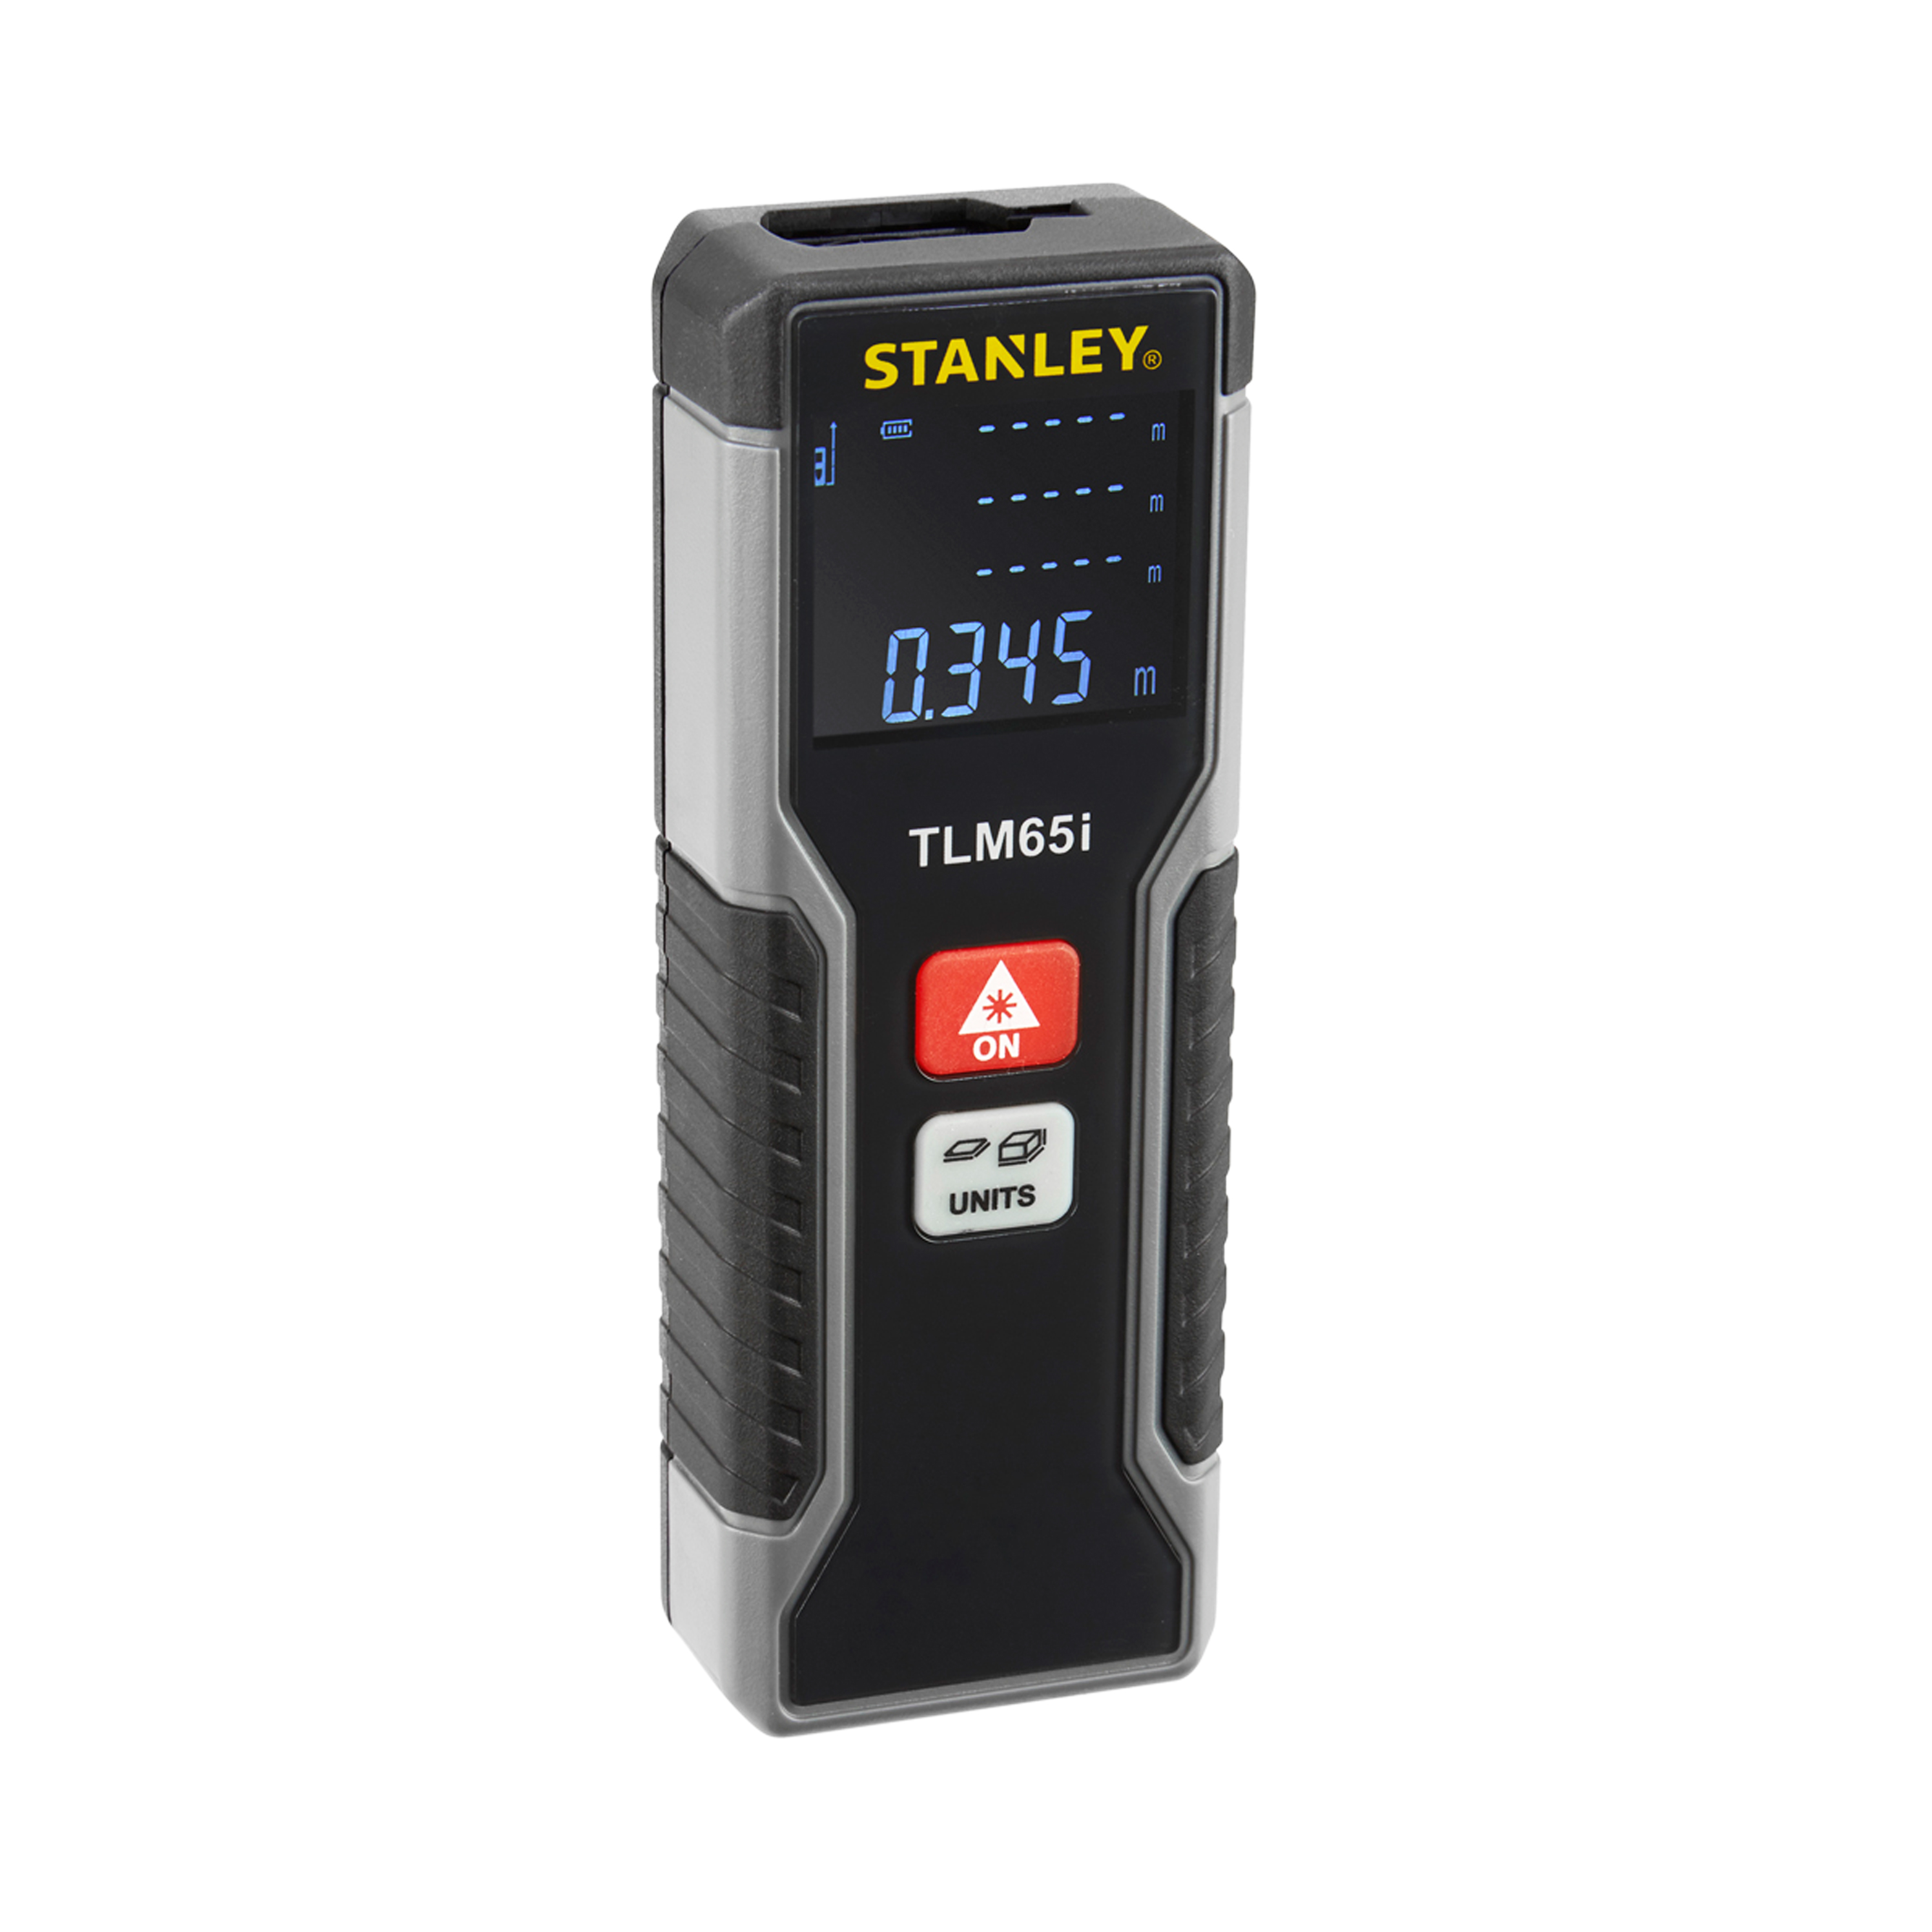 Mesure laser t l m tre 25 m tlm65 pro stanley krenobat outillage distribution - Telemetre laser stanley ...